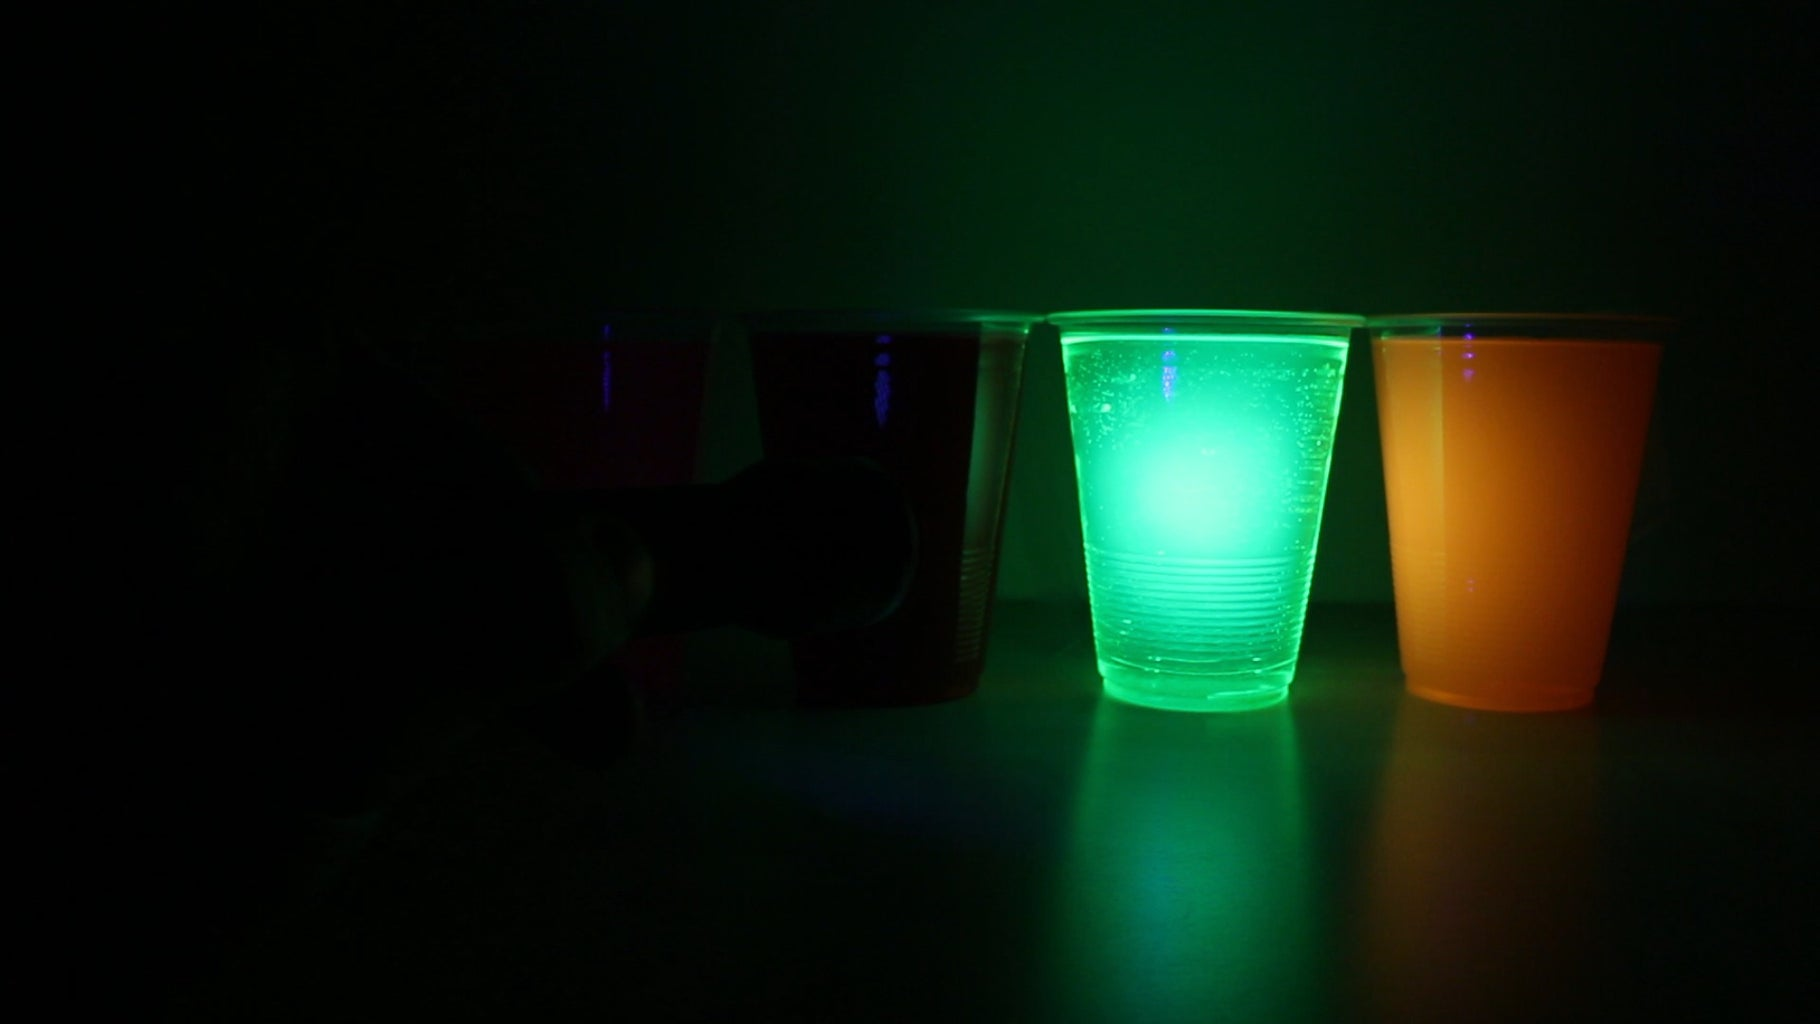 Making the Glowing Liquid